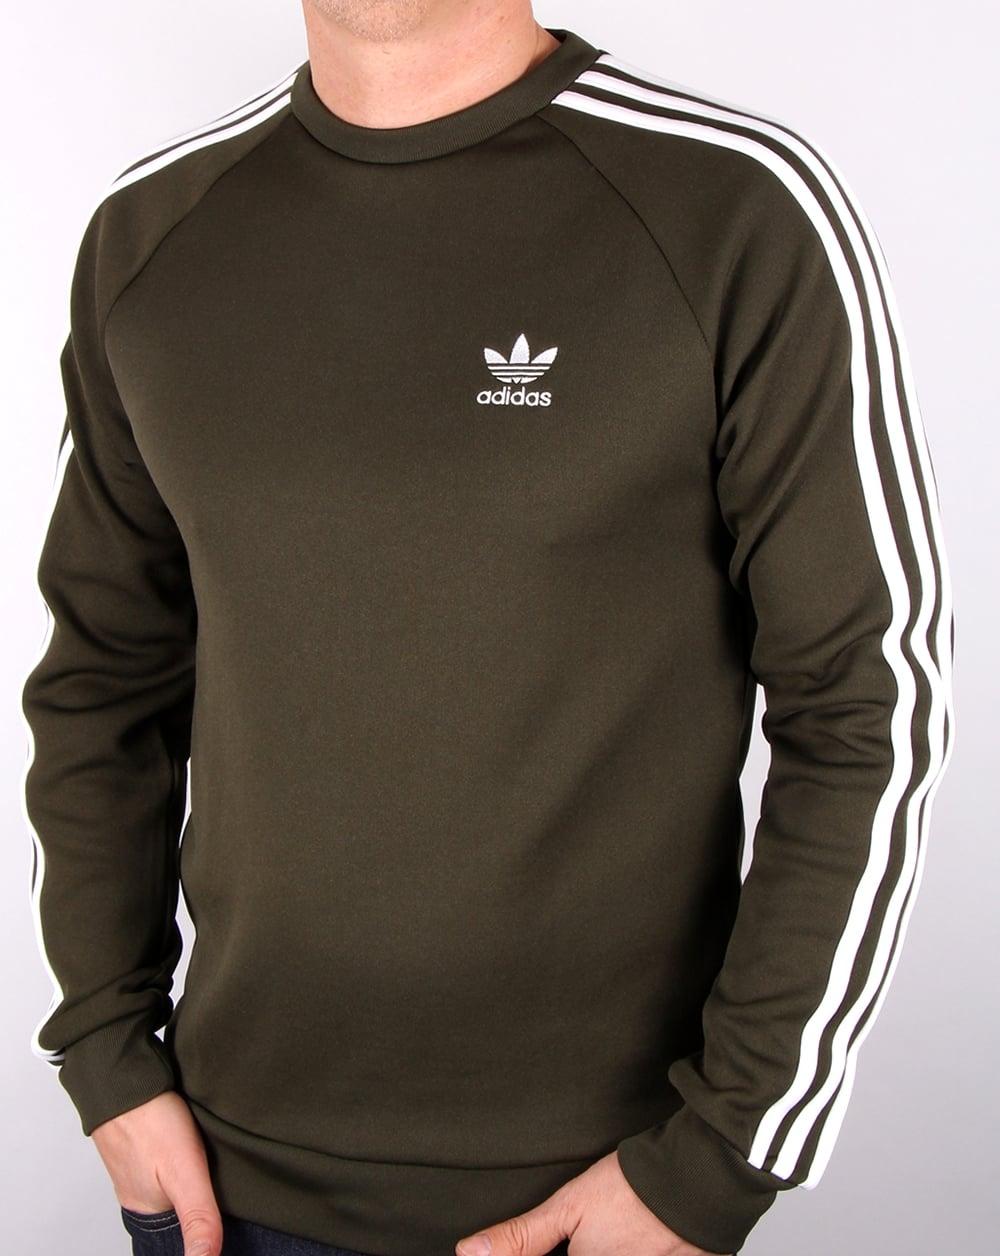 04d99603b7a3 adidas Originals Adidas Originals Crew Neck Sweat Khaki White